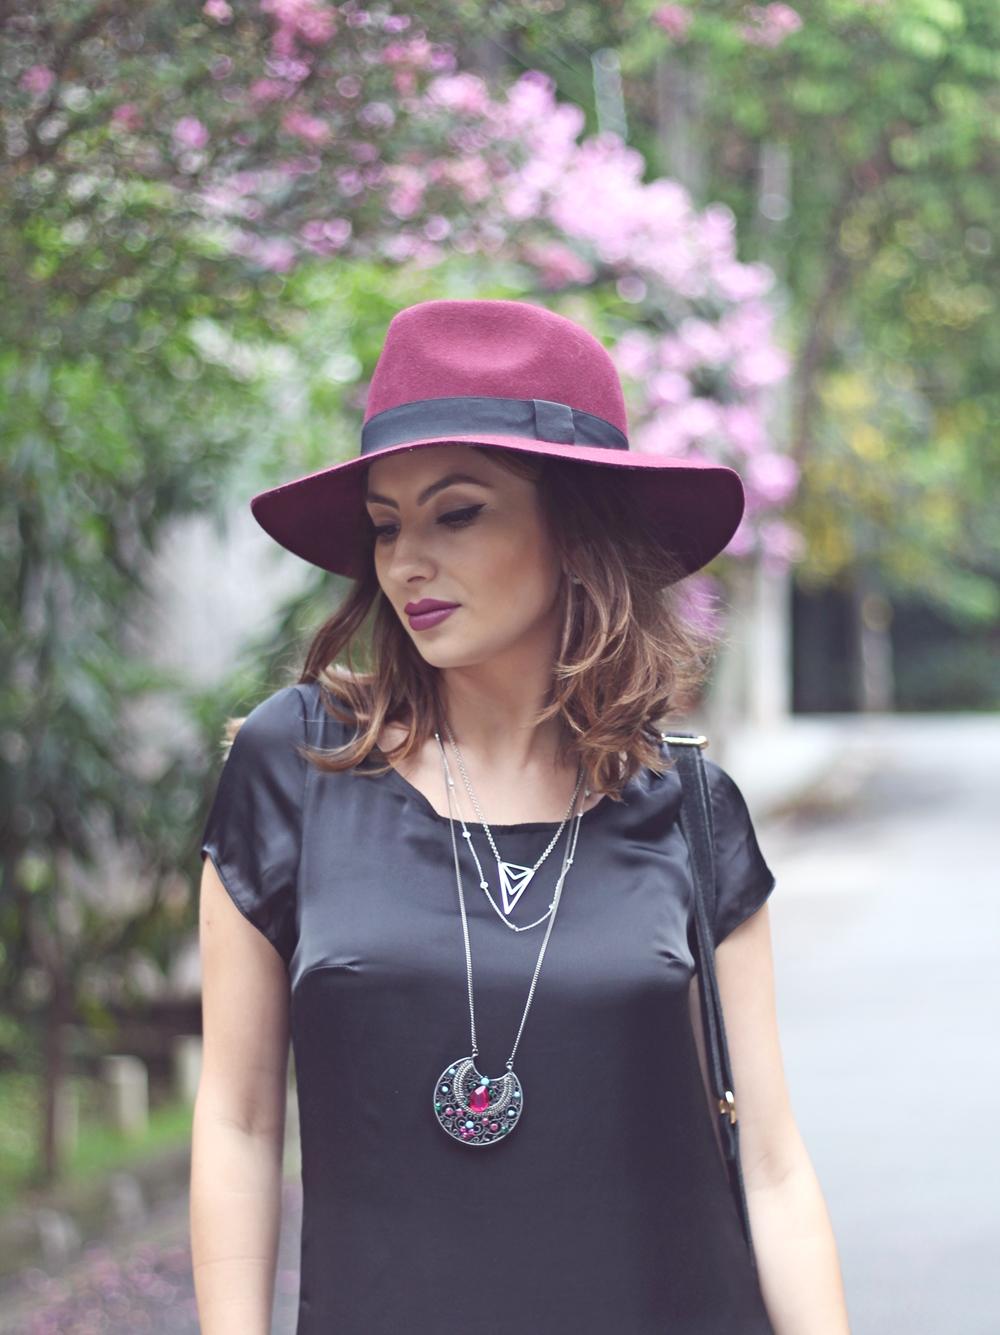 van-duarte-look-boho-lifestyle-outfit-3